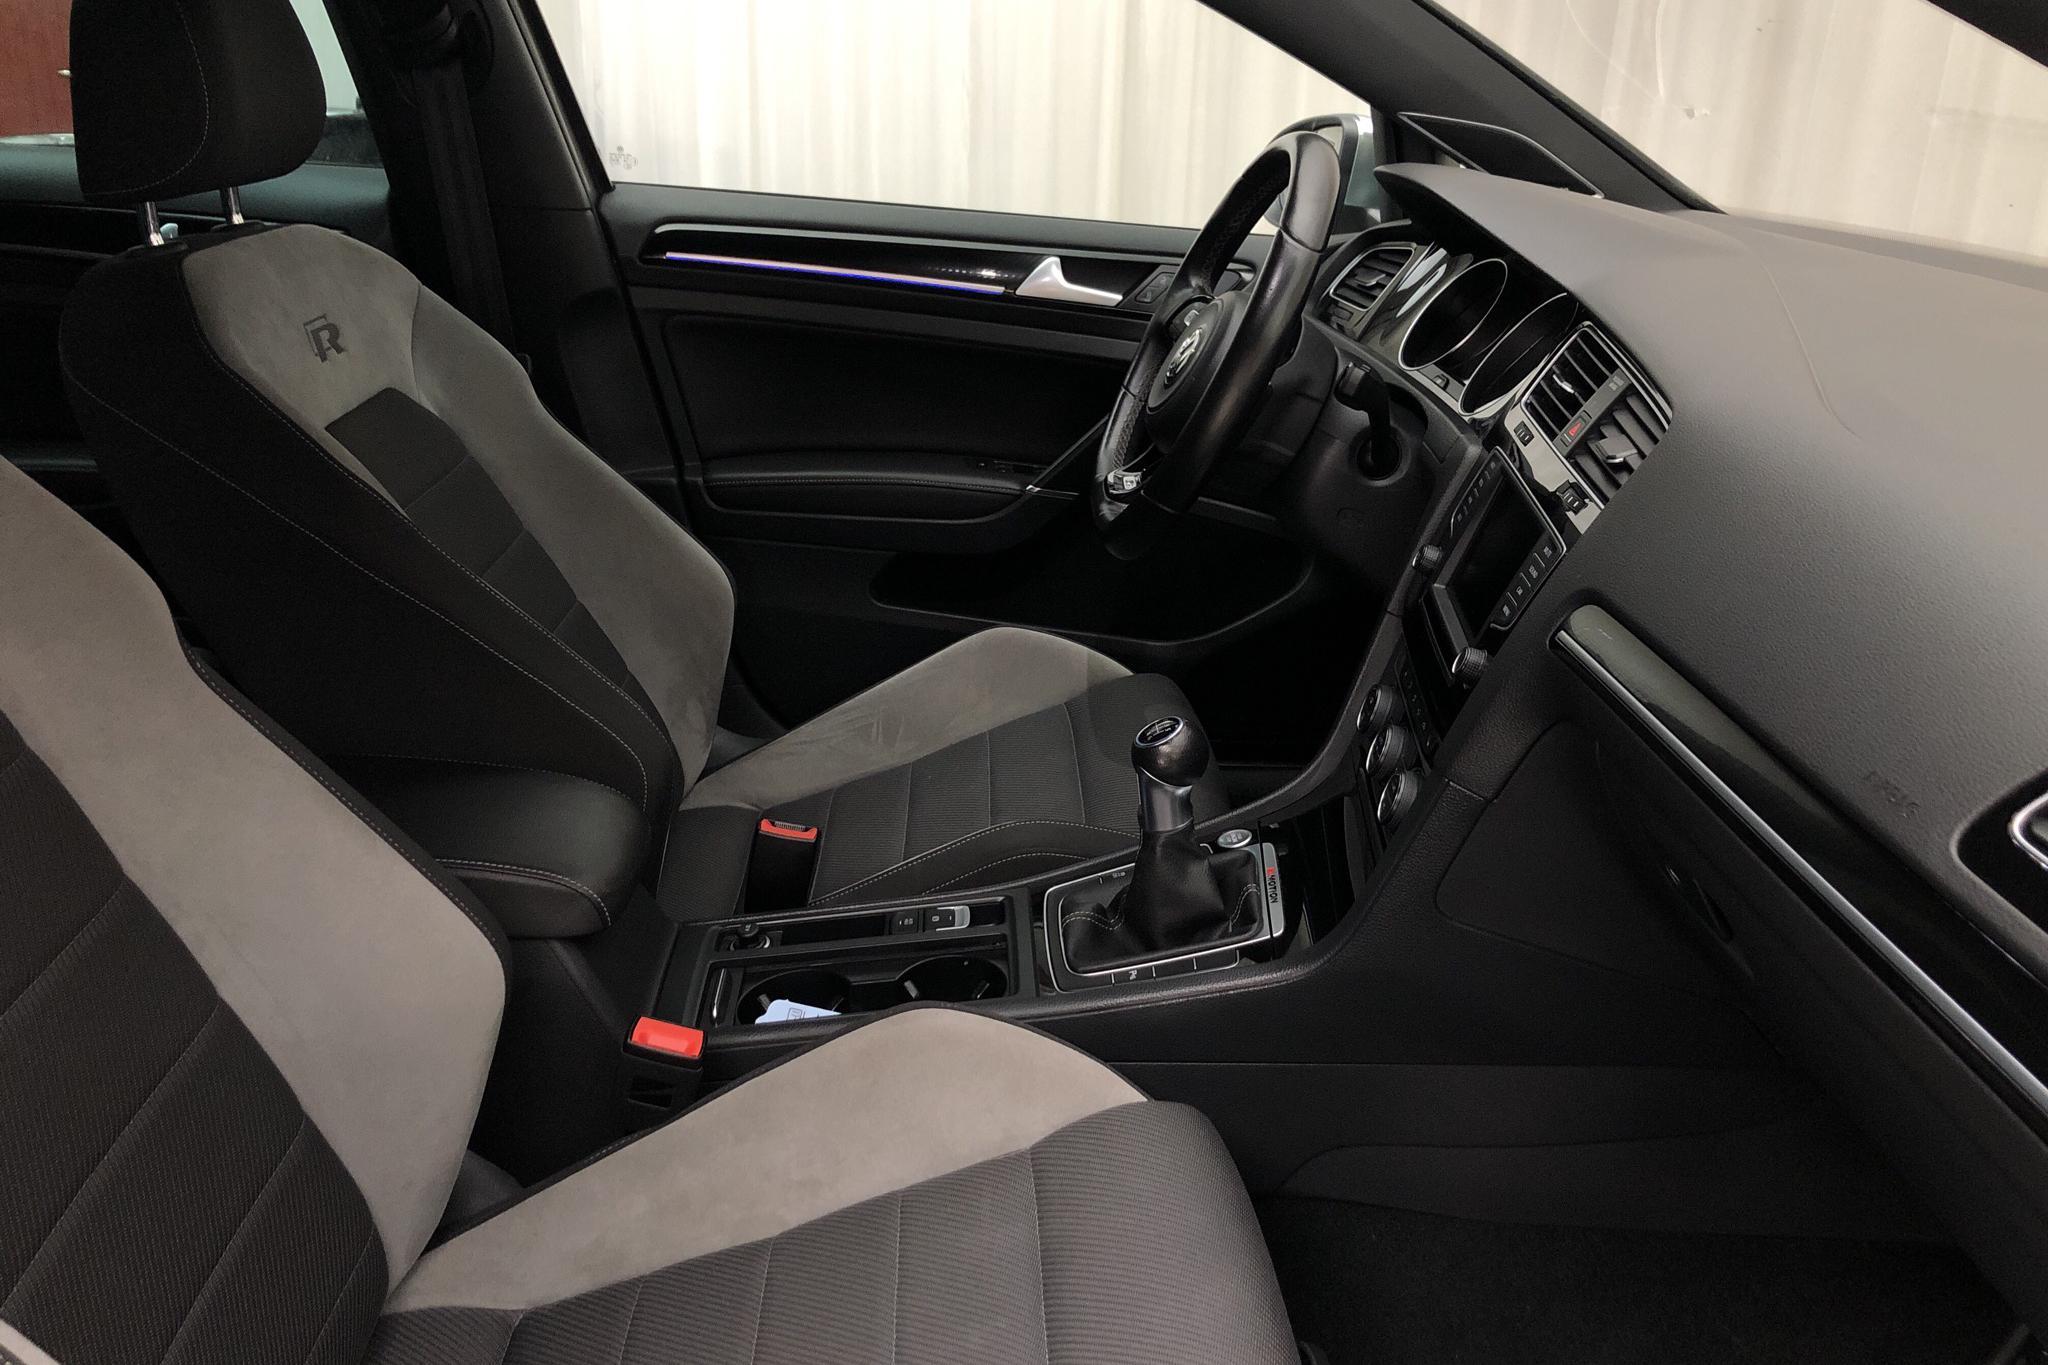 VW Golf VII 2.0 TSI R 5dr (300hk) - 88 460 km - Manual - gray - 2016